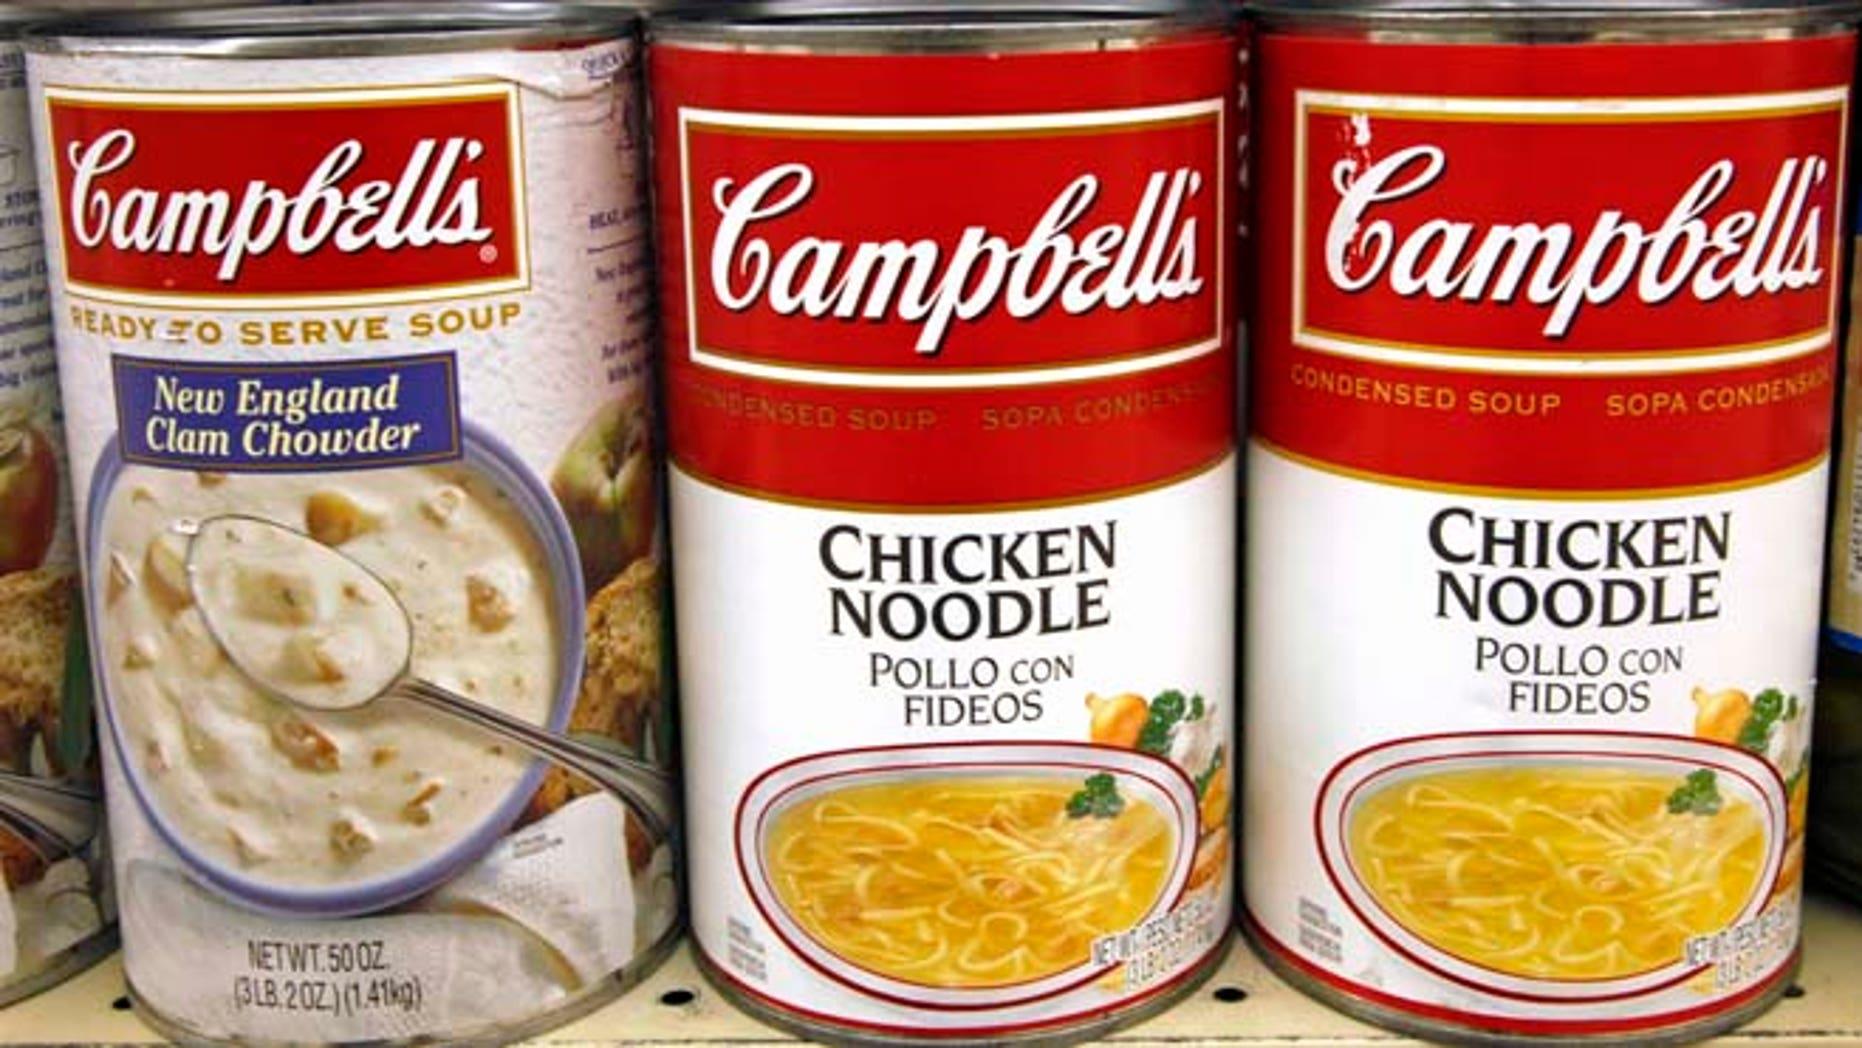 Food Fight Alabama Principal Seeks Cans Of Food To Defend Against